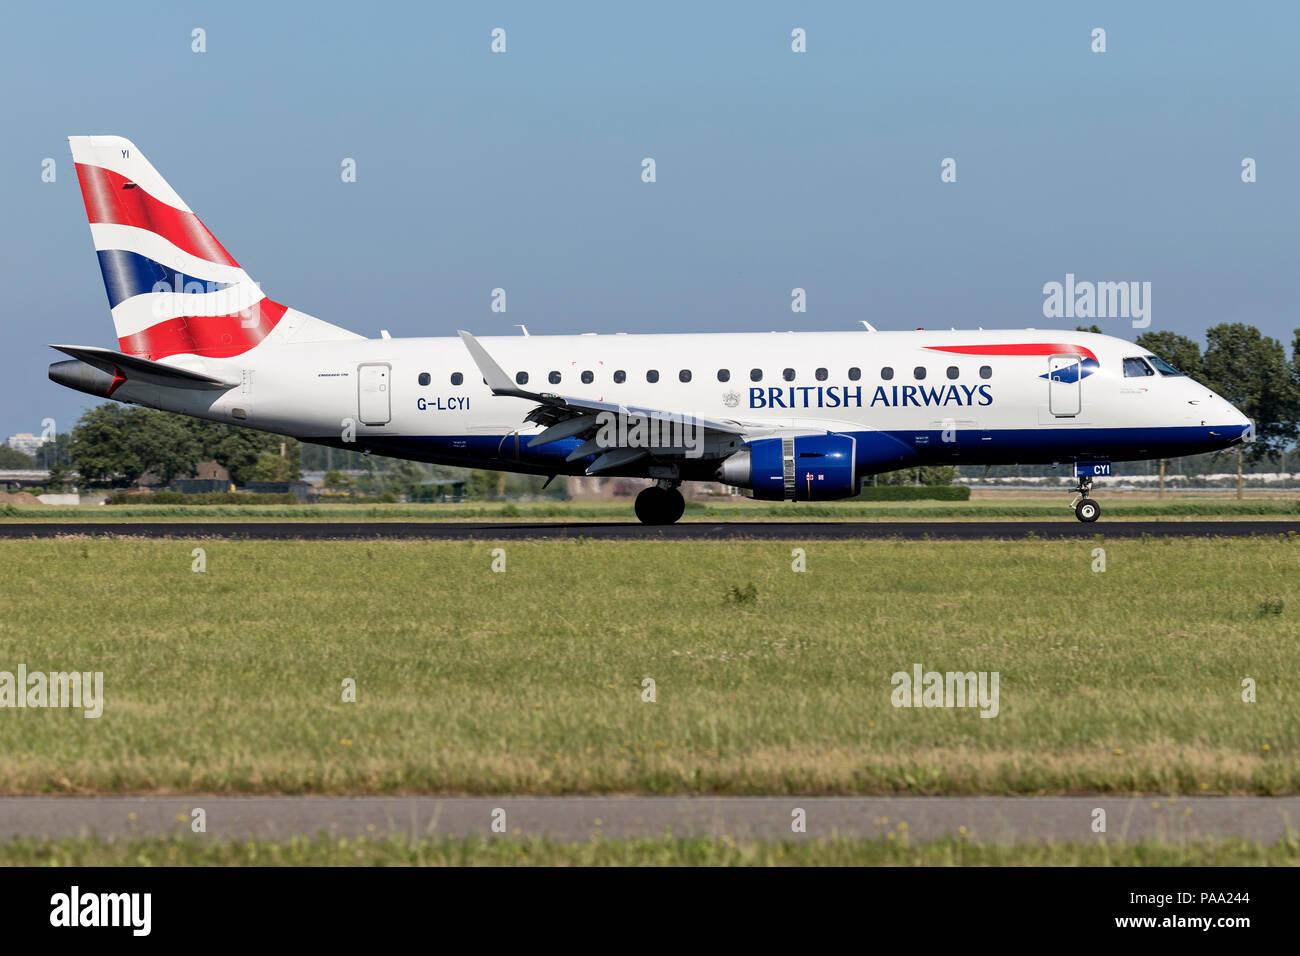 British Airways Embraer ERJ-175 (BA Cityflyer) with registration G-LCYI just landed on runway 18R (Polderbaan) of Amsterdam Airport Schiphol.Stock Photo